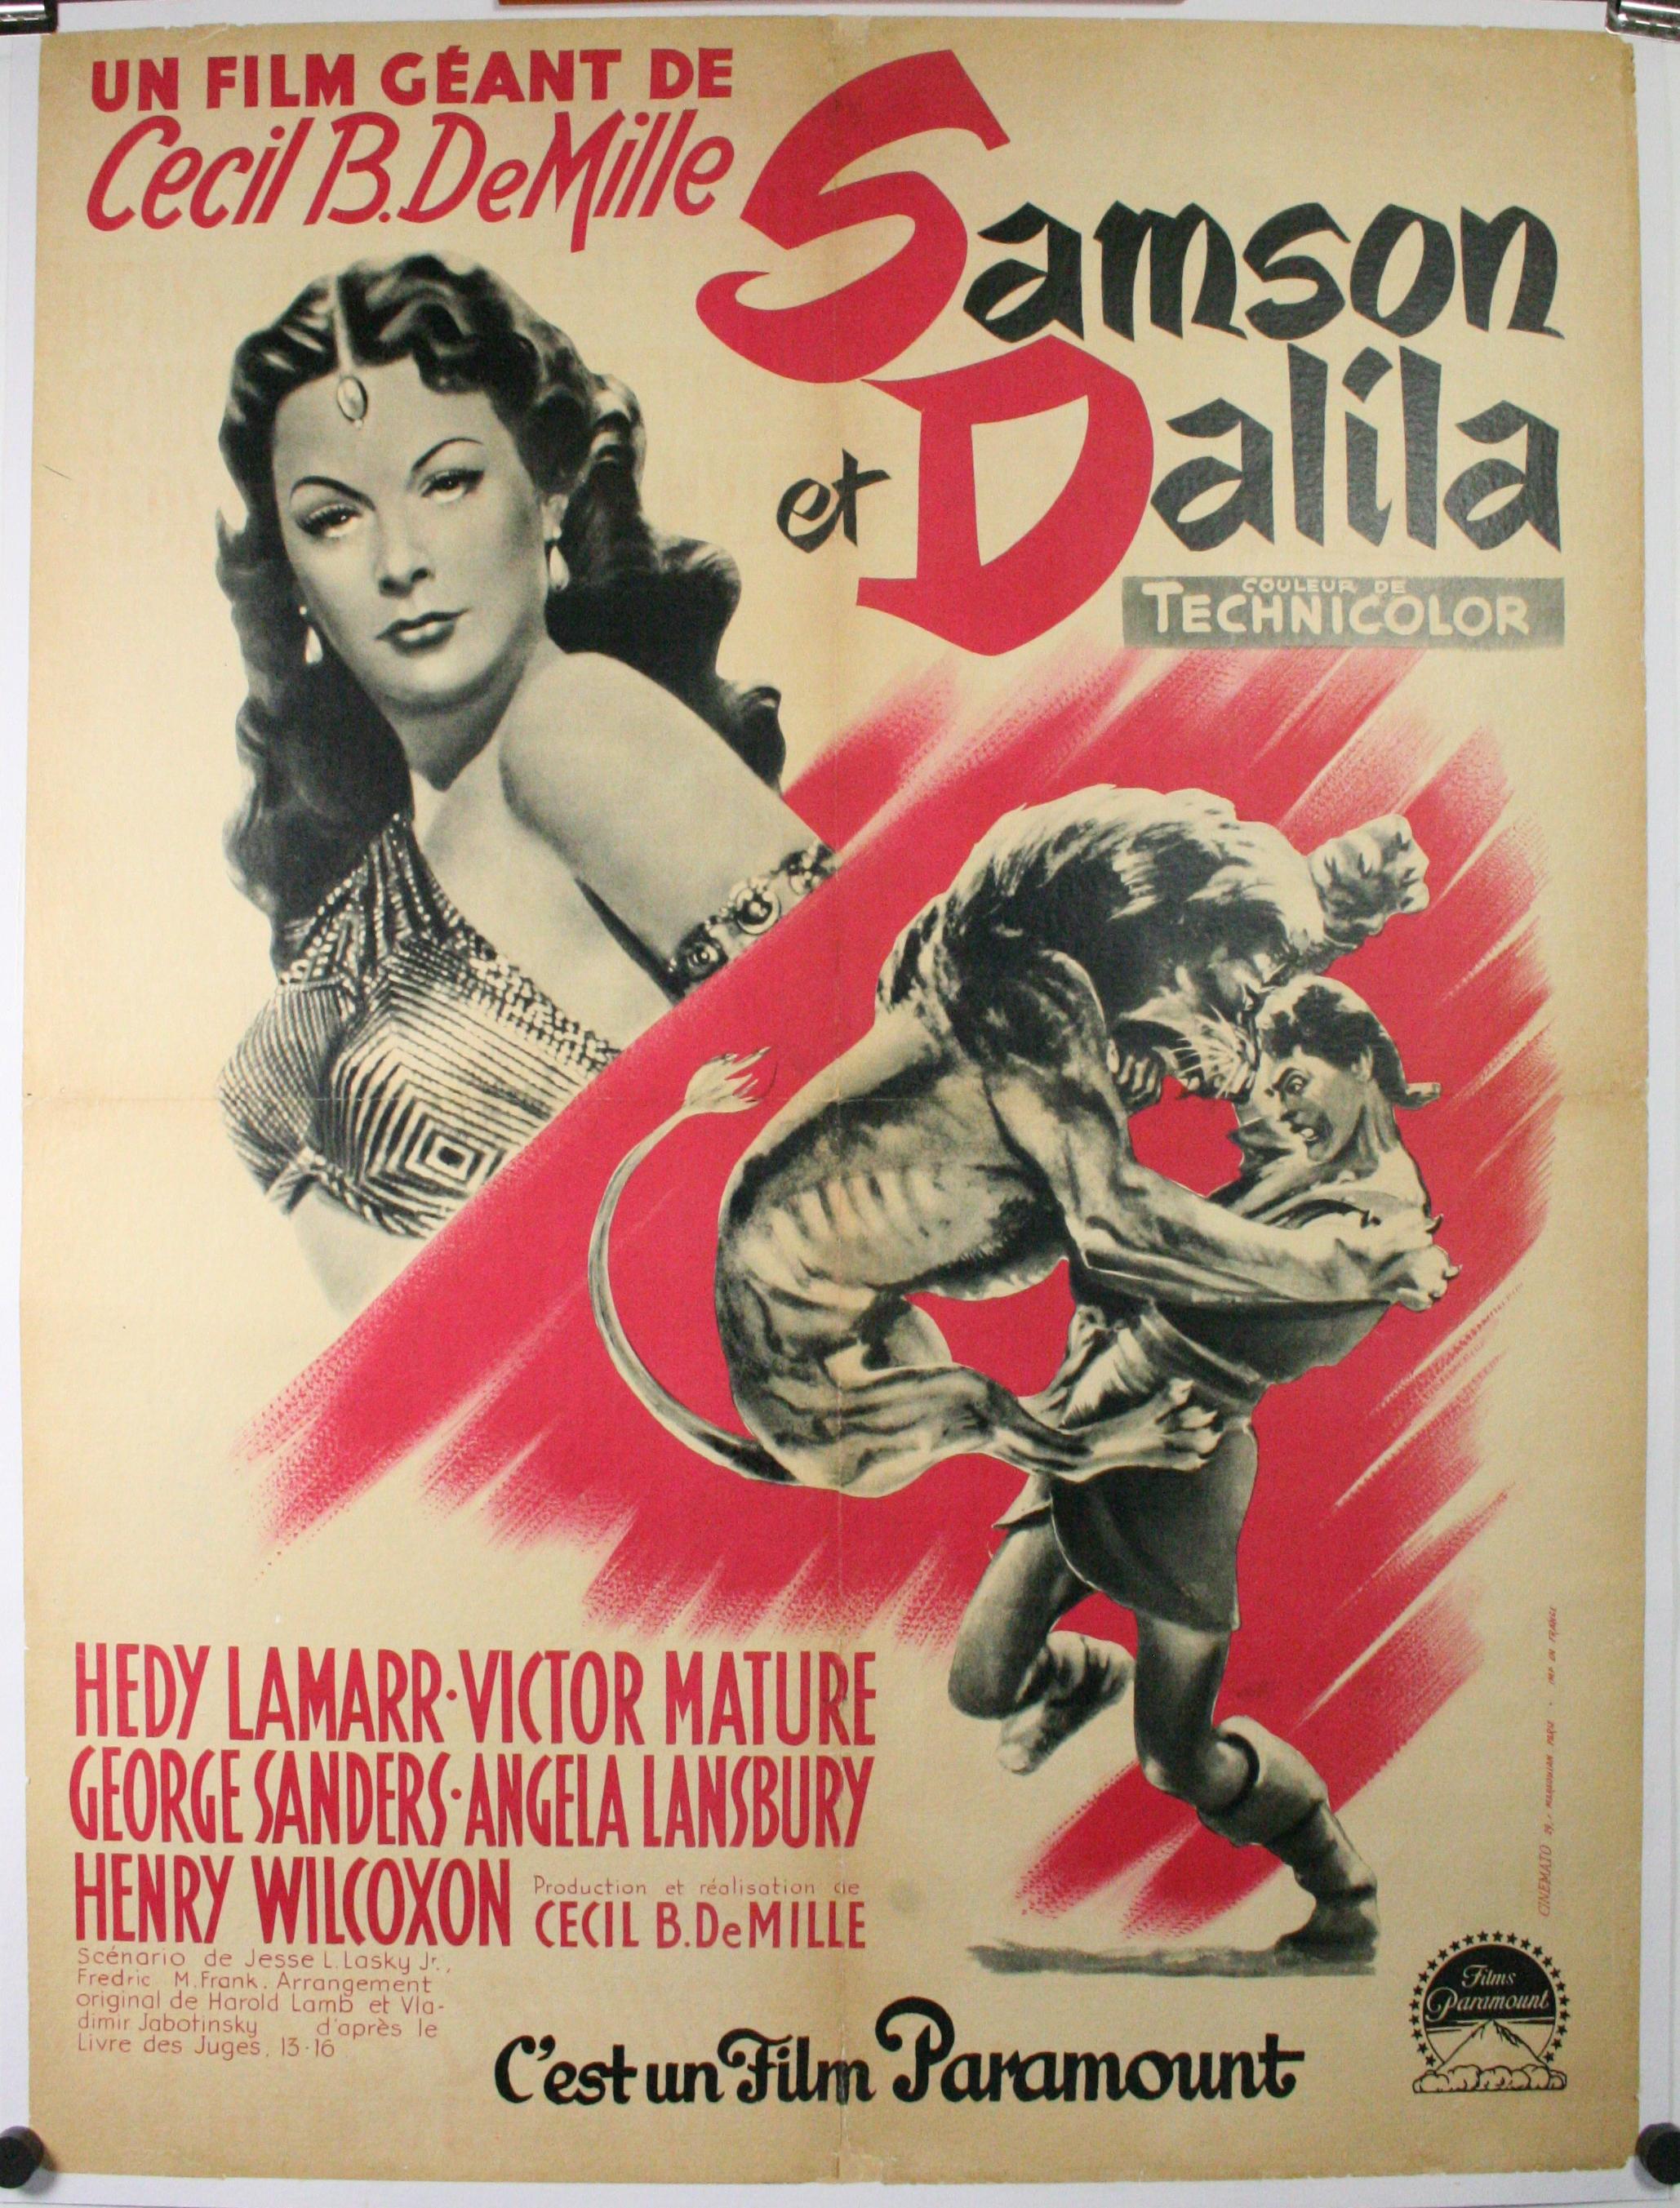 samson et dalila samson and delilah original french movie poster